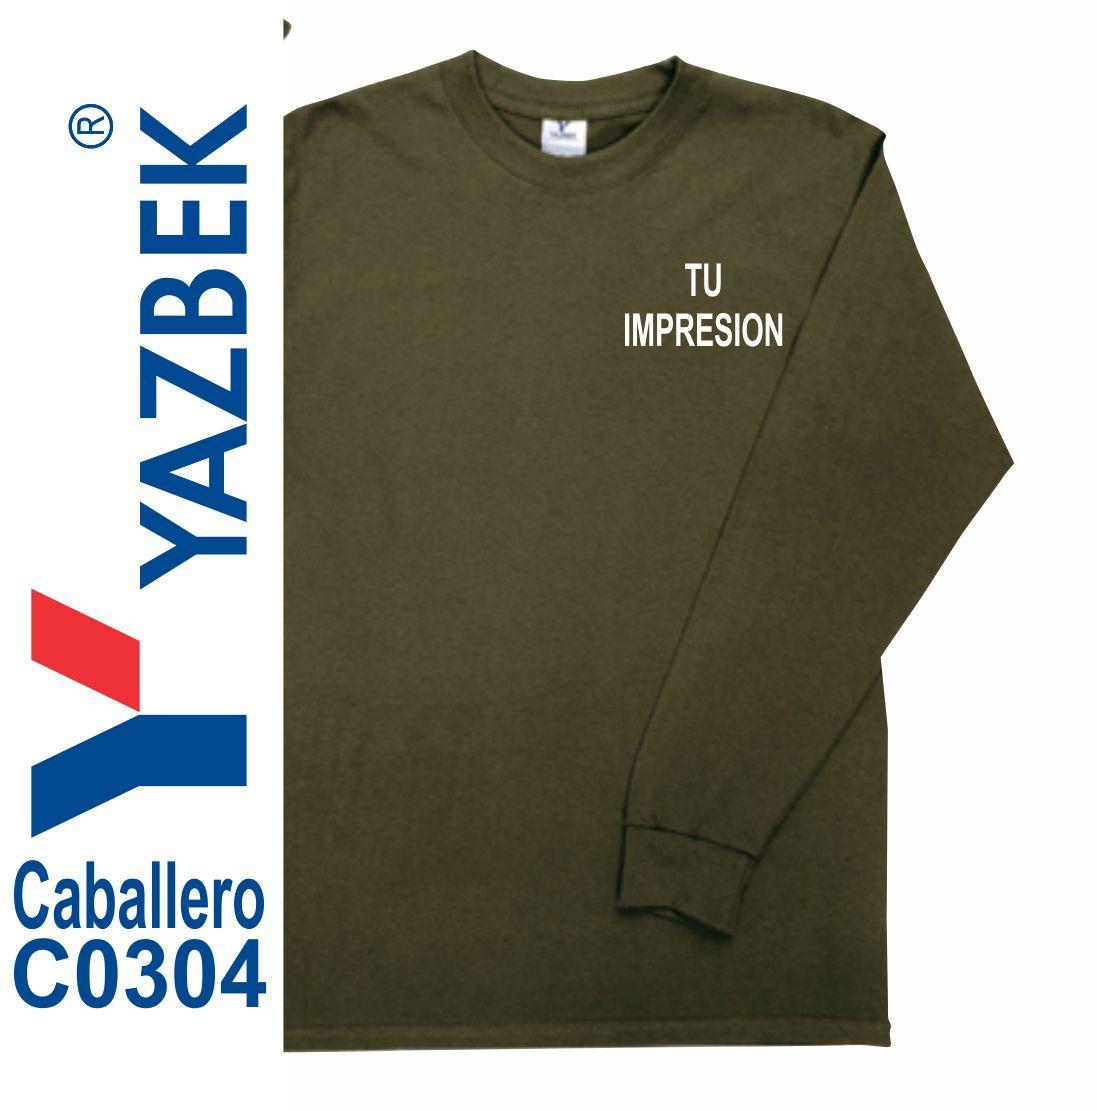 87d33da459fe9 Playera Yazbek Caballero Manga Larga C0304 Principal